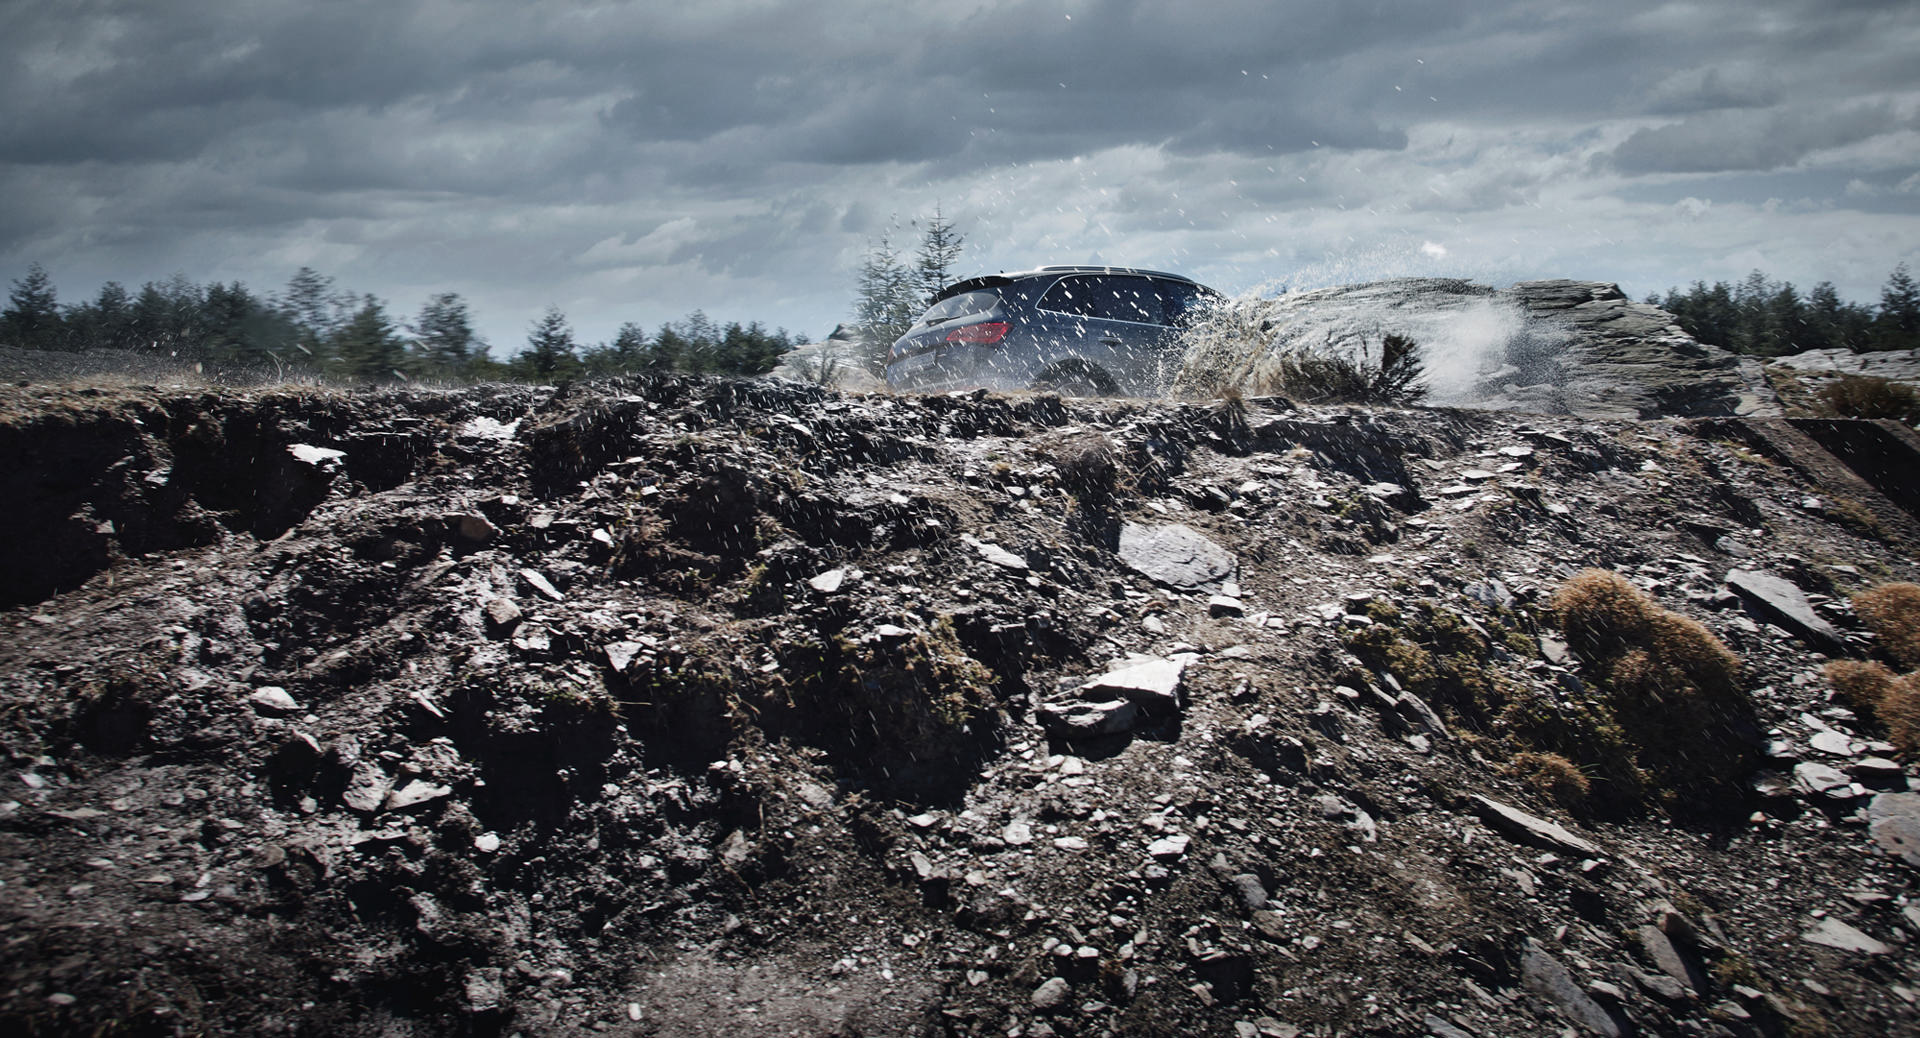 offroad, rocks, mud, Audi Rainmaker, Audi Magazin, Loved, Anke Luckmann, www.ankeluckmann.com, kai tietz,